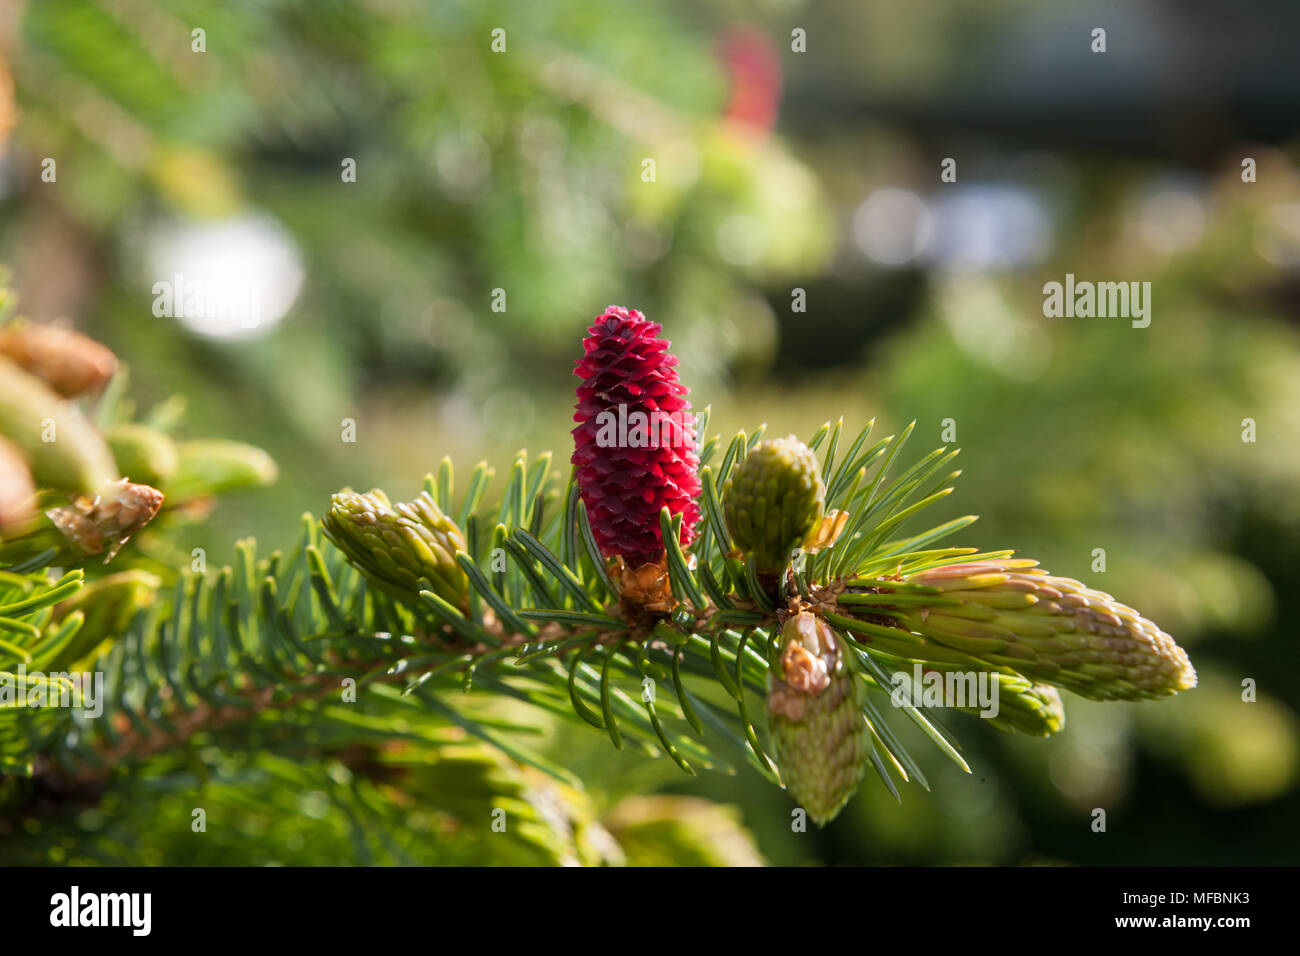 Jezo spruce, Ajangran (Picea jezoensis) - Stock Image